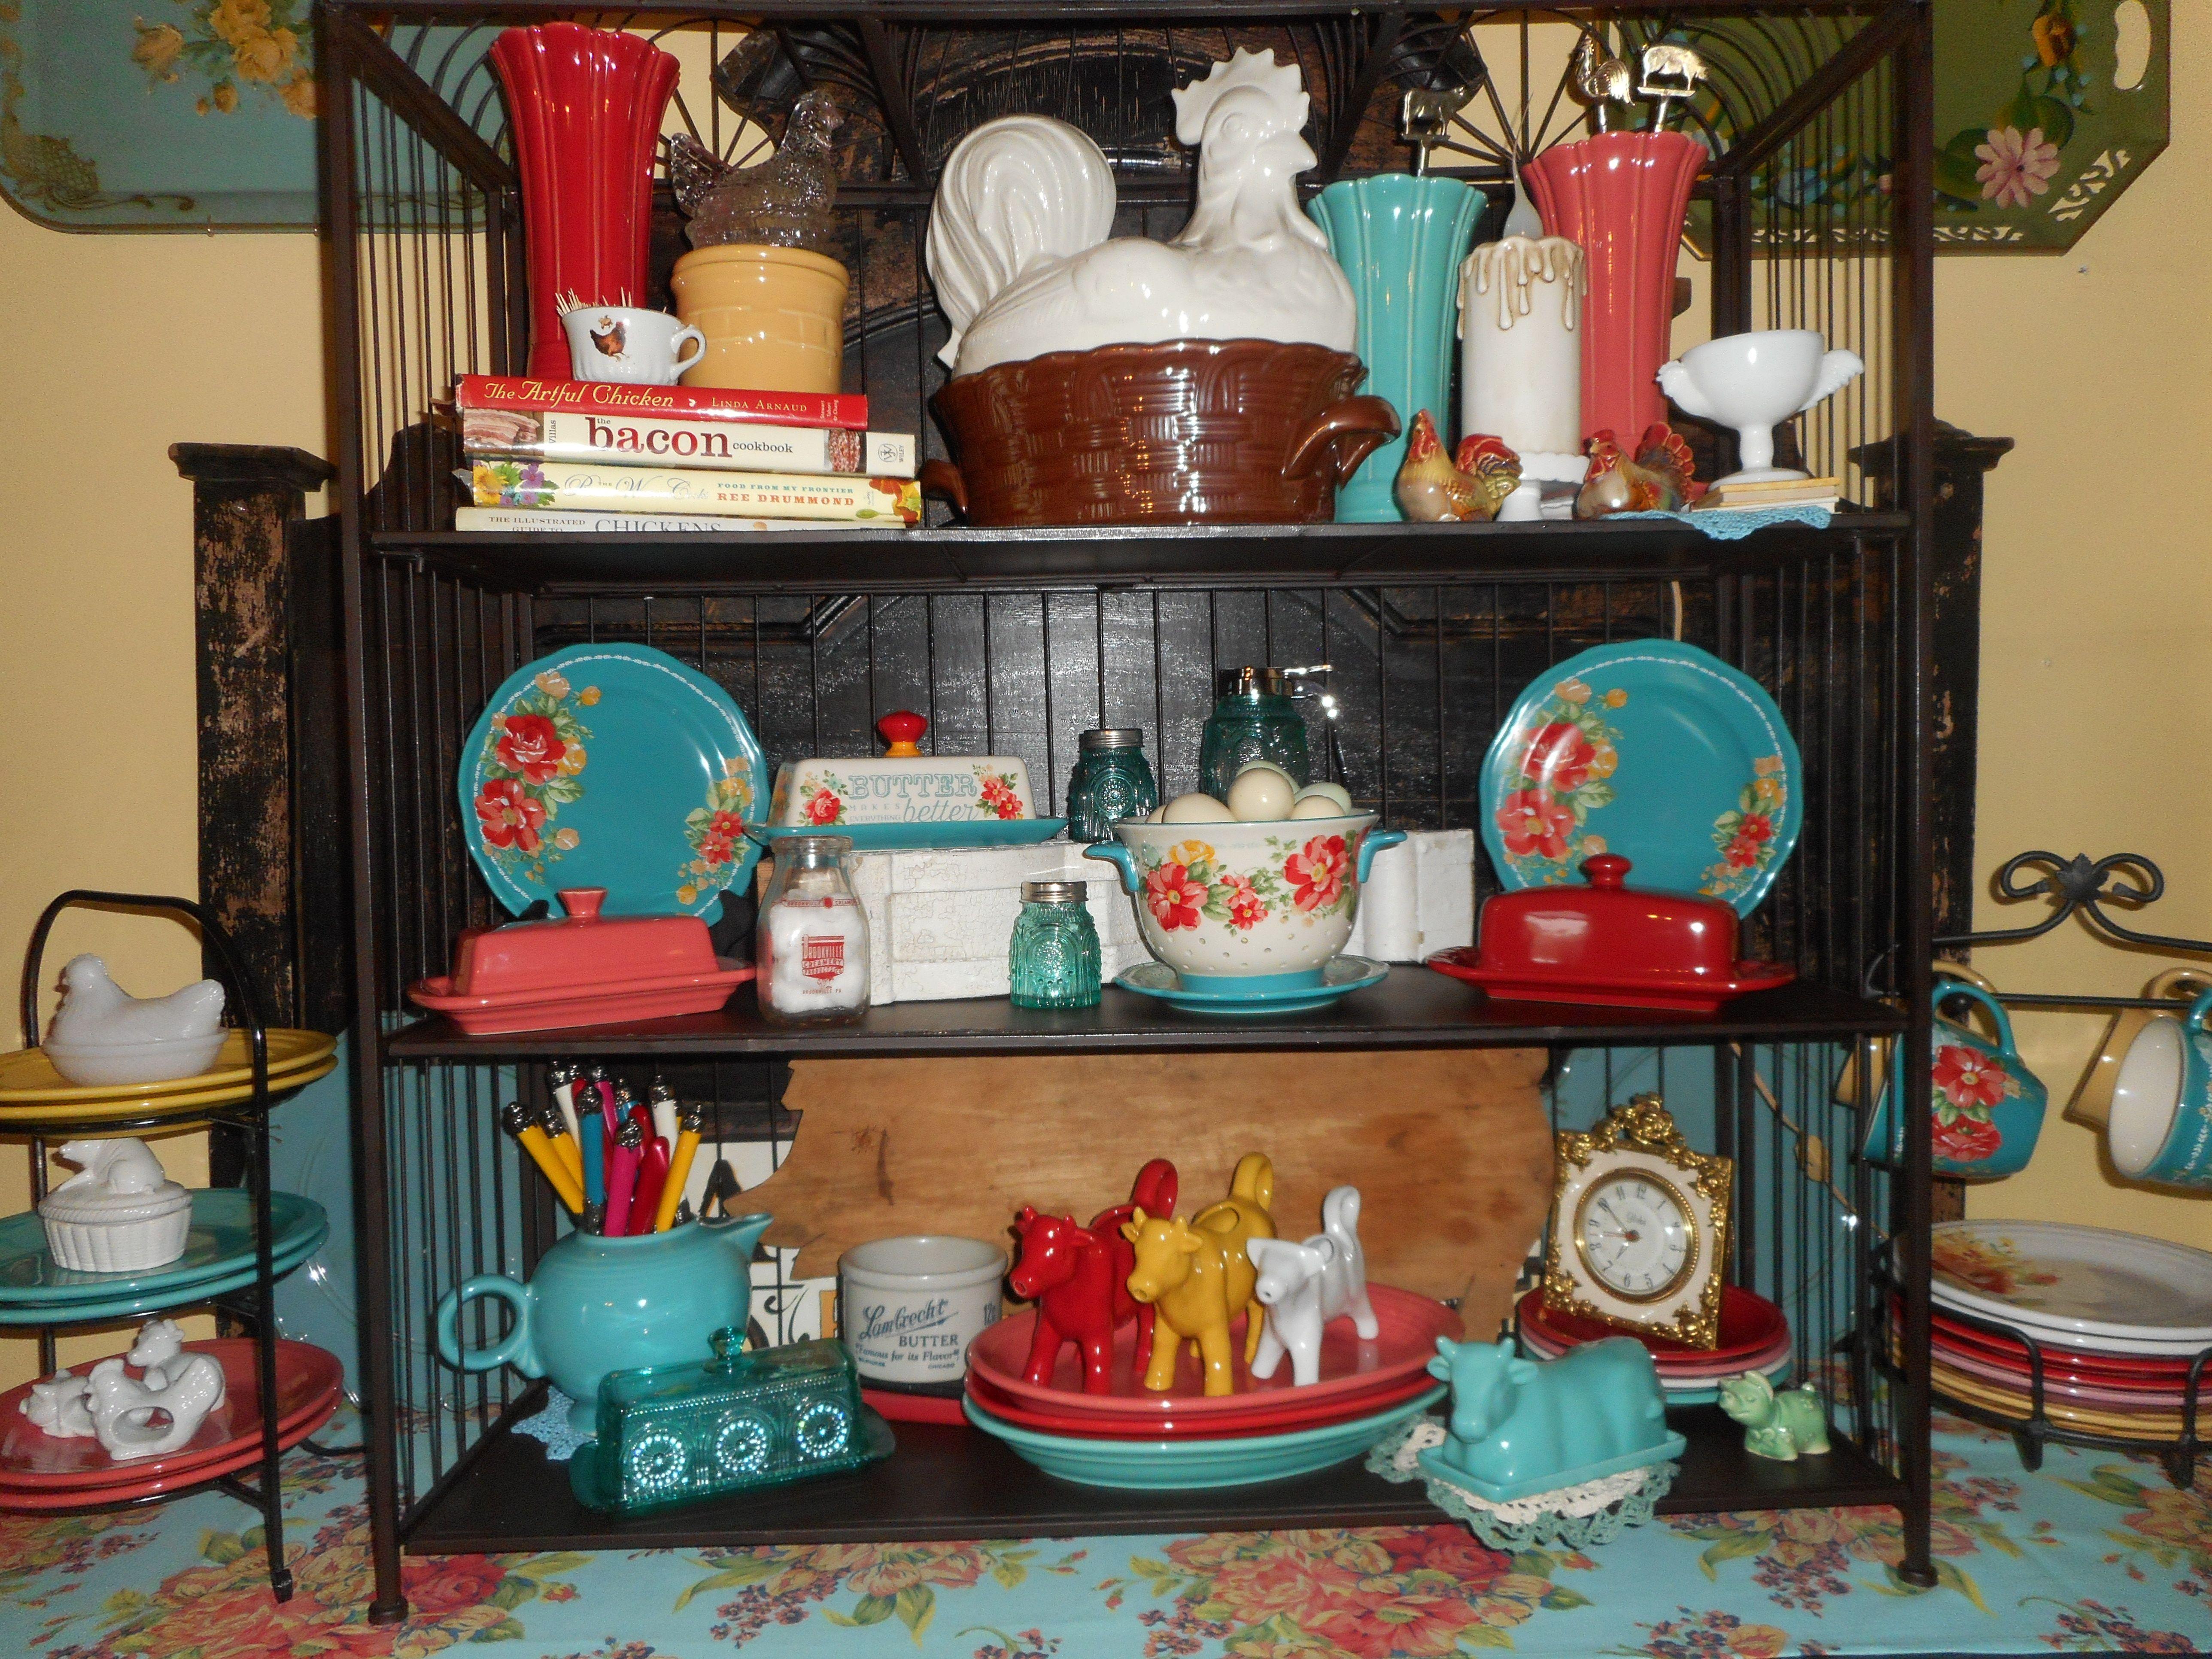 Birdcage Shelves Filled With Fiesta Pioneer Woman And Longaberger Pioneer Woman Dinnerware Pioneer Woman Kitchen Pioneer Woman Kitchen Decor